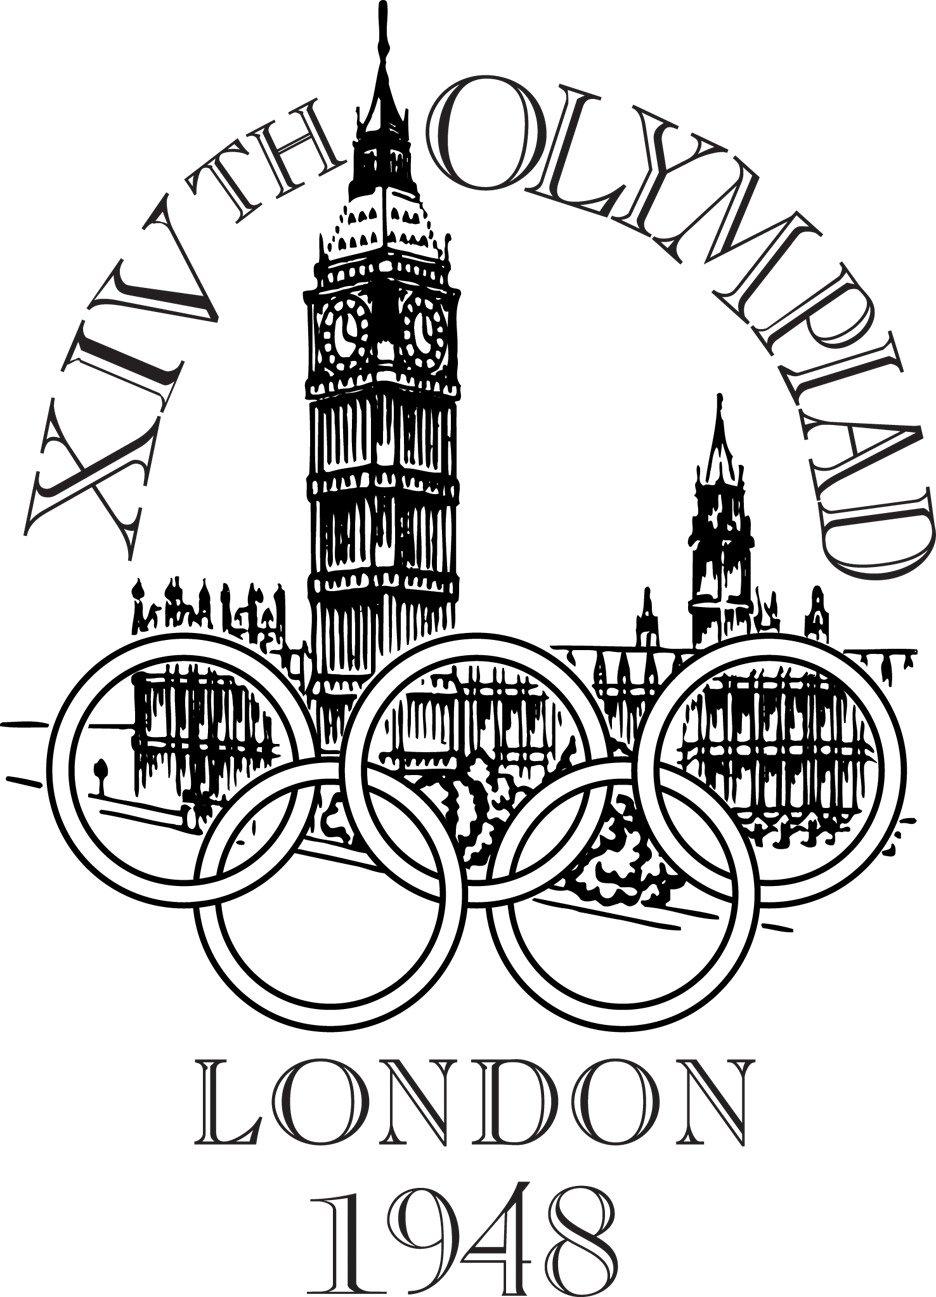 طراحی لوگو لندن ۱۹۴۸